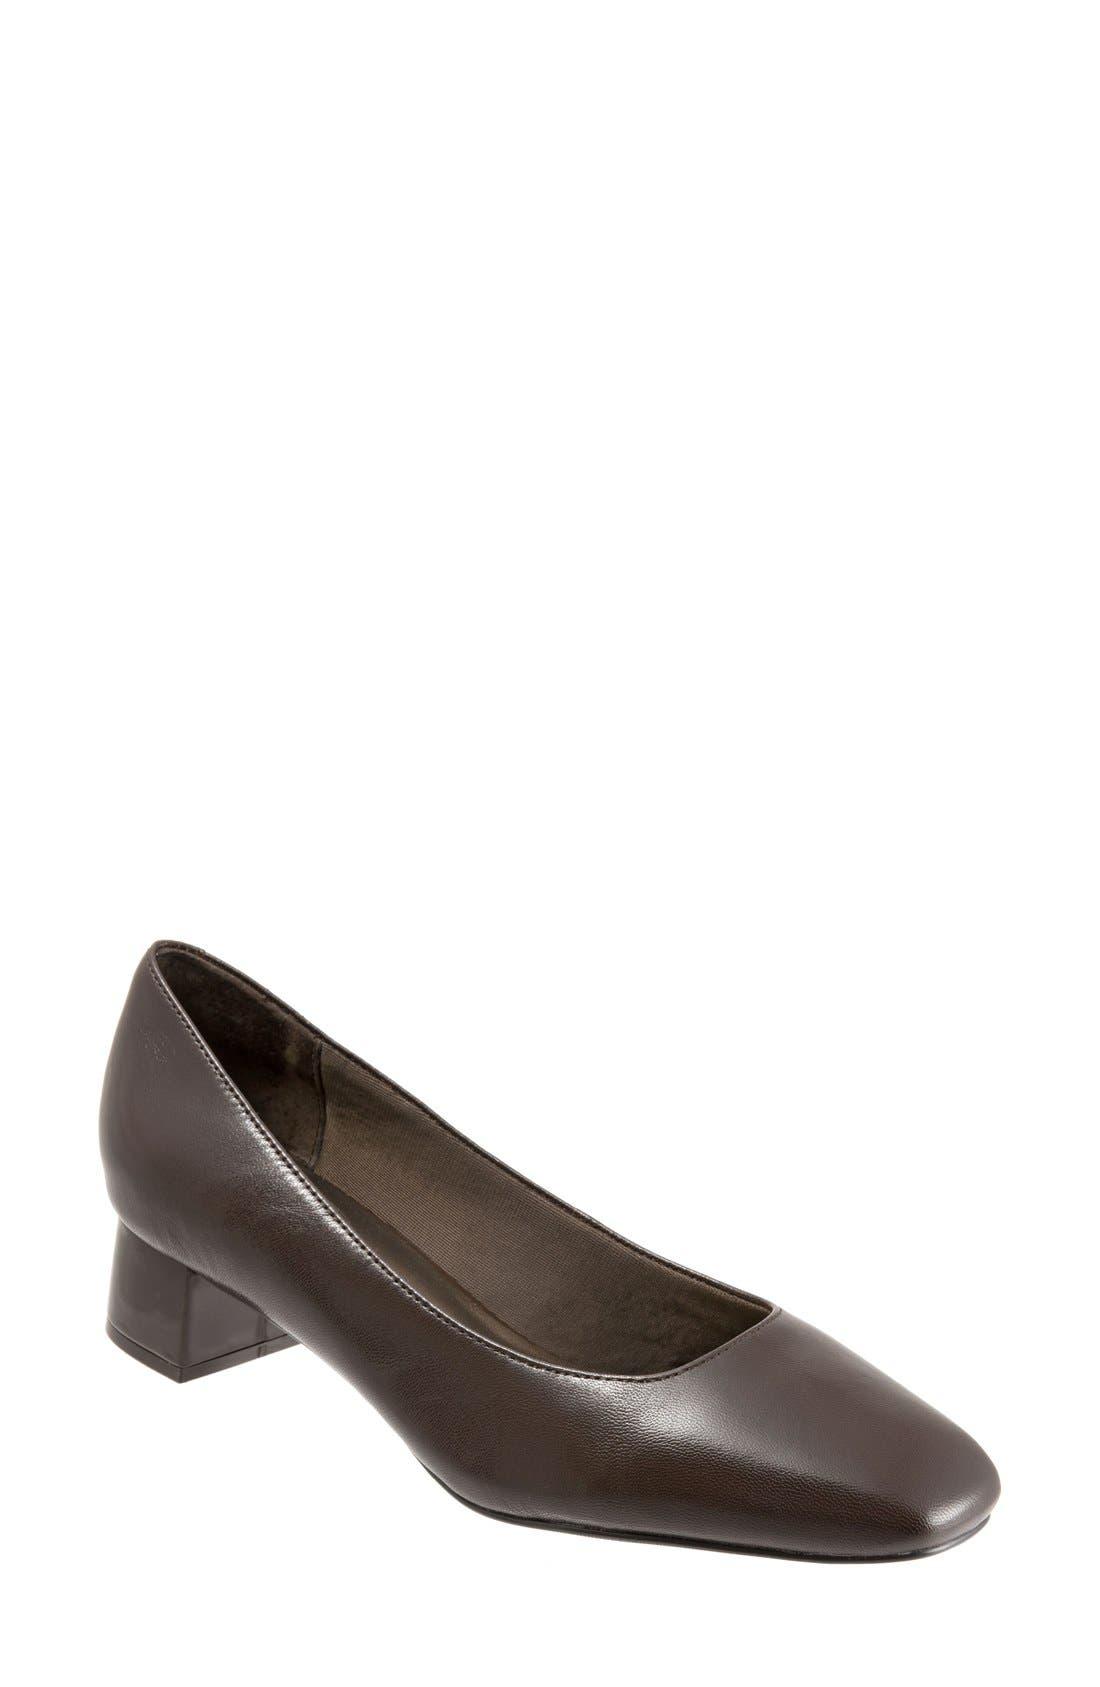 Lola Pump,                         Main,                         color, Dark Brown Leather